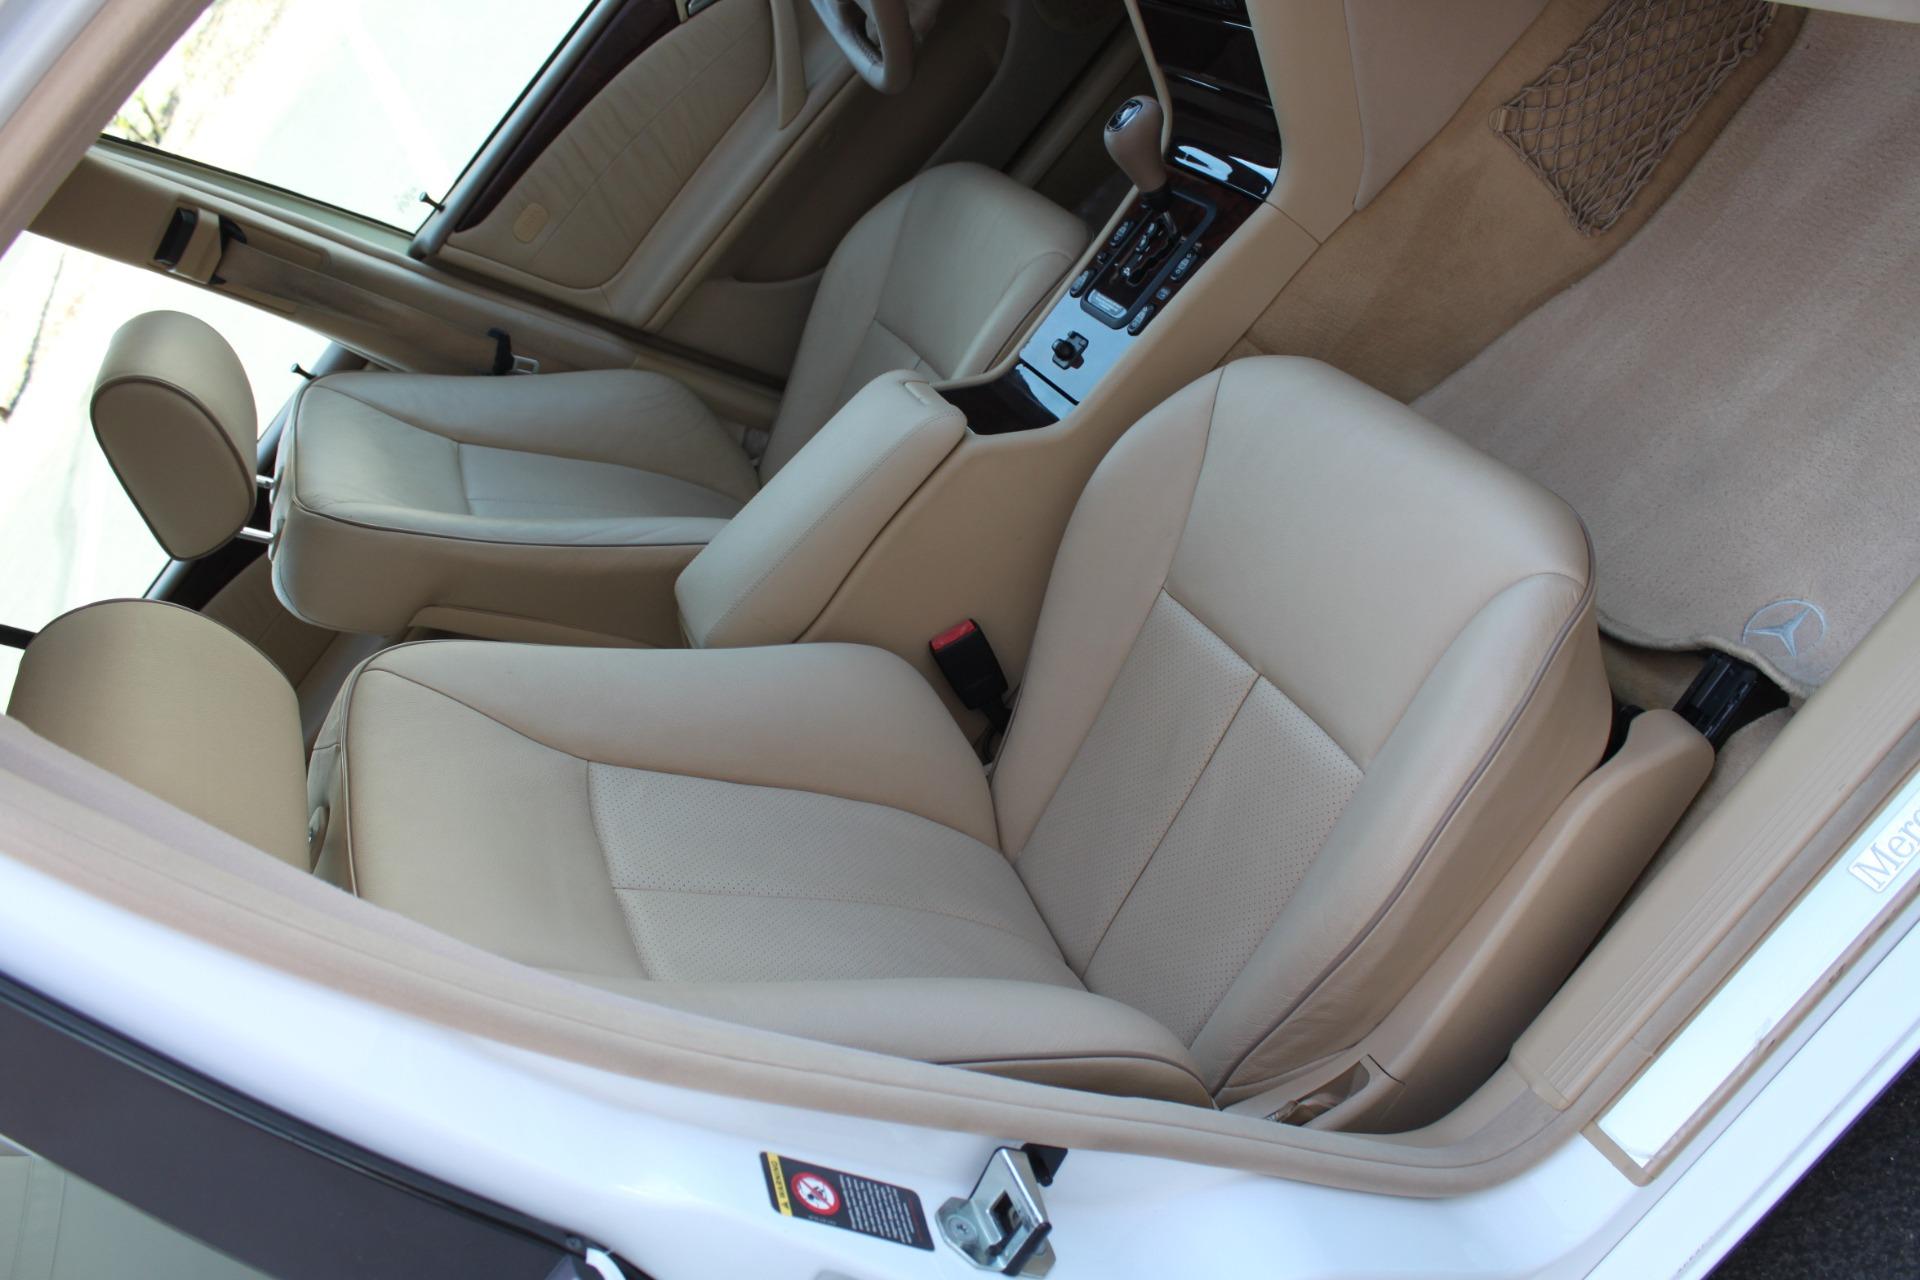 Used-2000-Mercedes-Benz-E-Class-Wagon-Grand-Cherokee